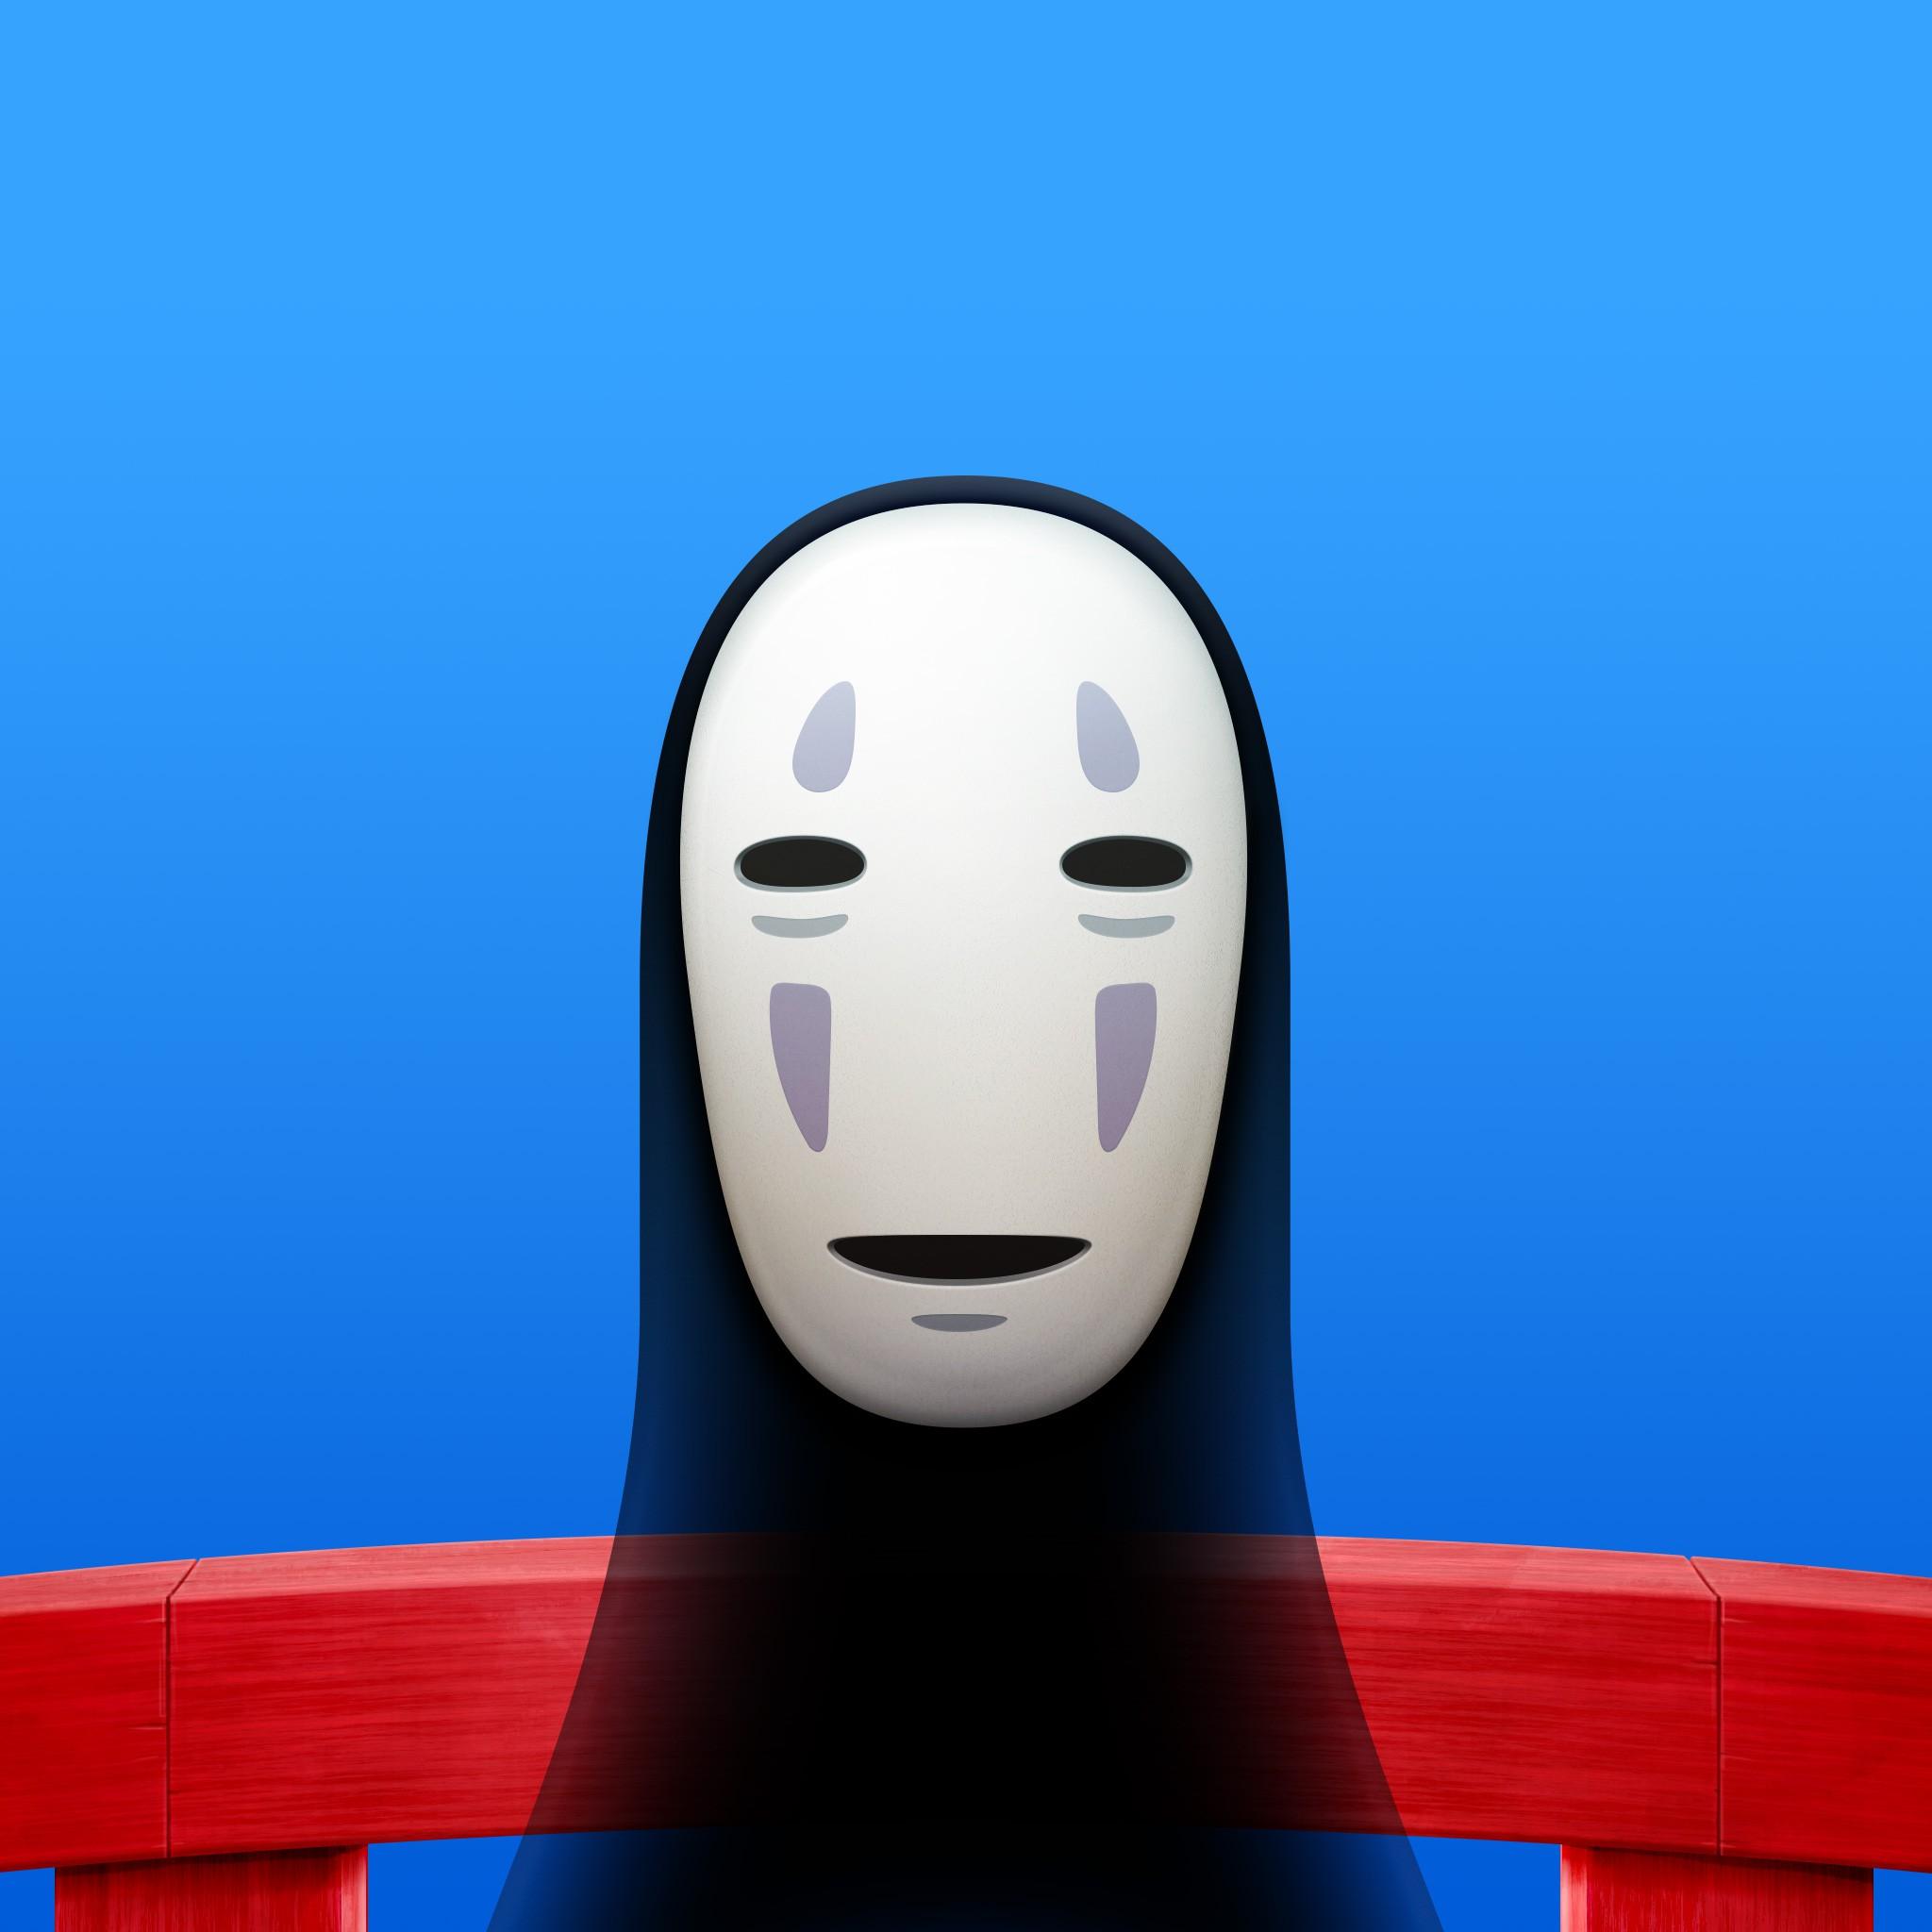 Animated Wallpaper Android Tablet David Lanham Ghibli Icons